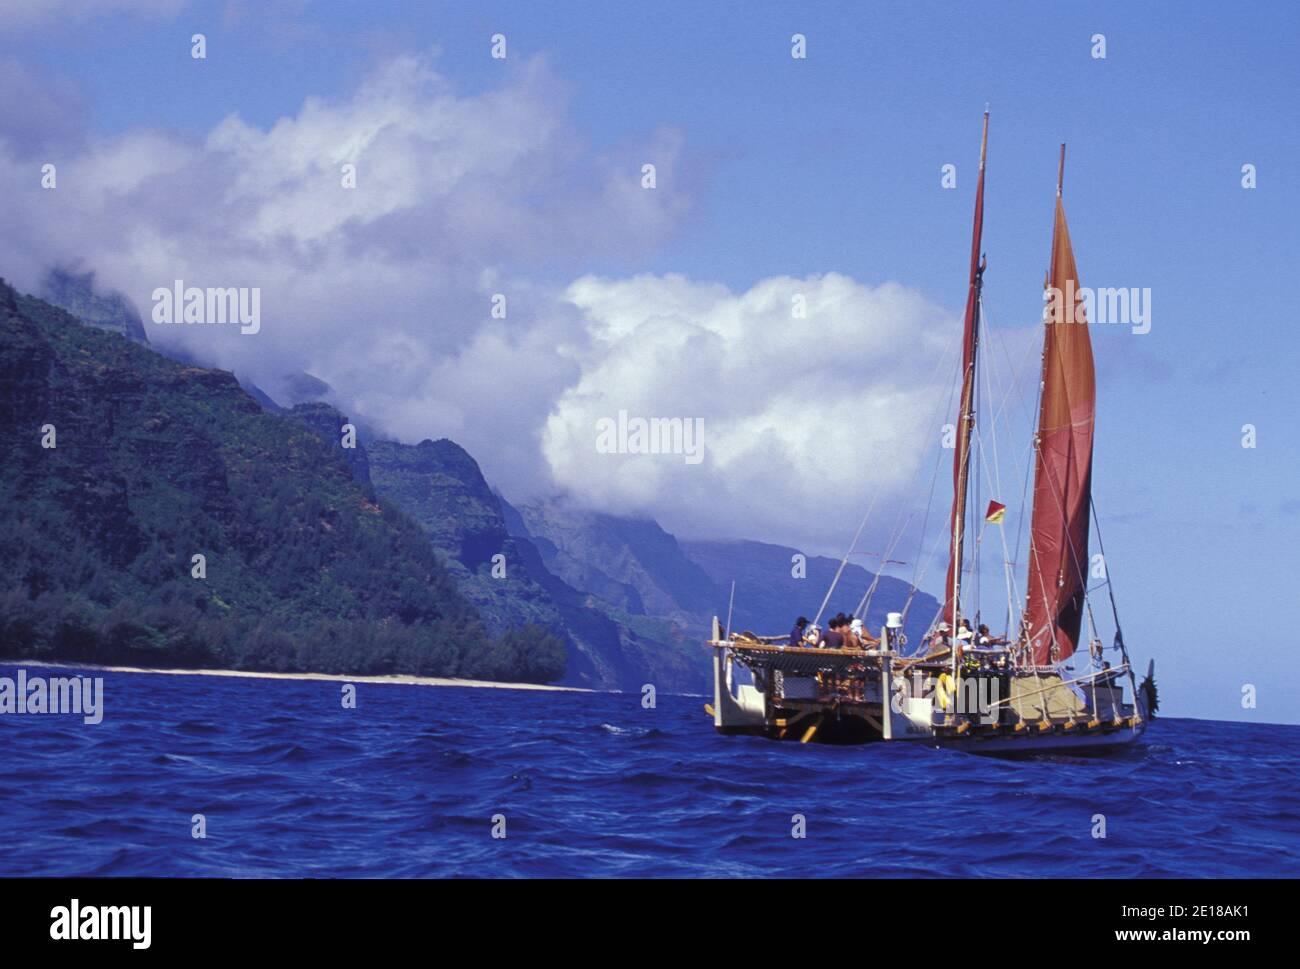 Hokulea, a traditional double hulled Hawaiian sailing canoe, sets sail off the Na Pali Coast for the voyage to the Northwestern Hawaiian Islands Stock Photo